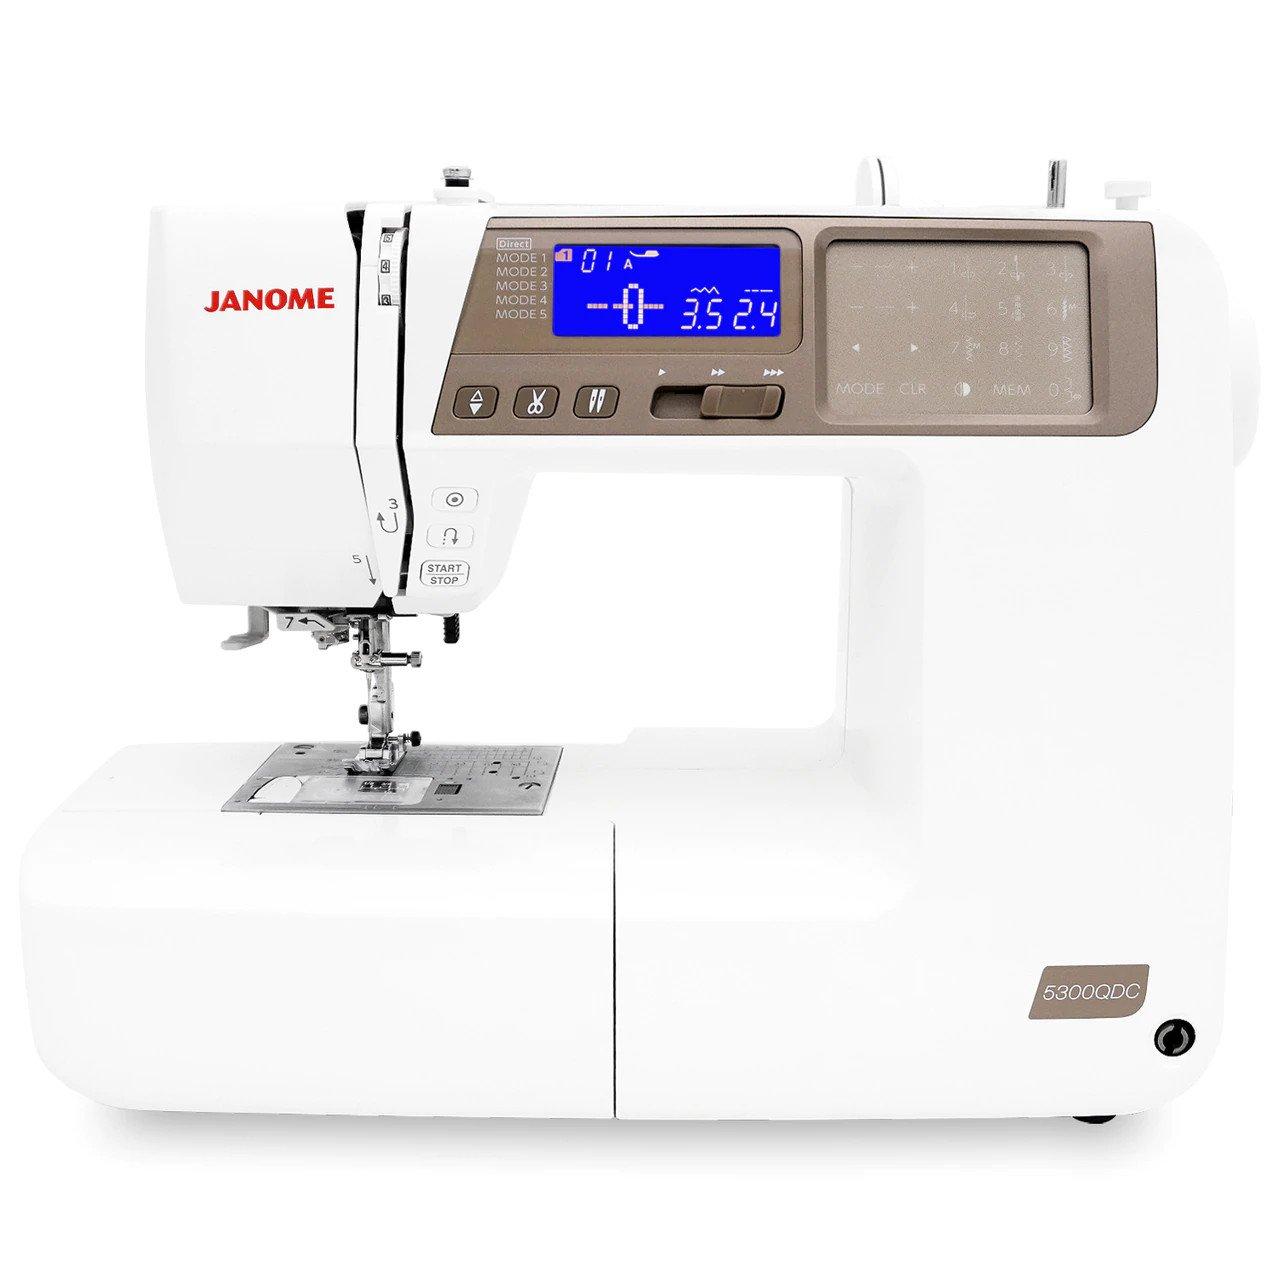 Janome 5300QDC-T Sewing Machine